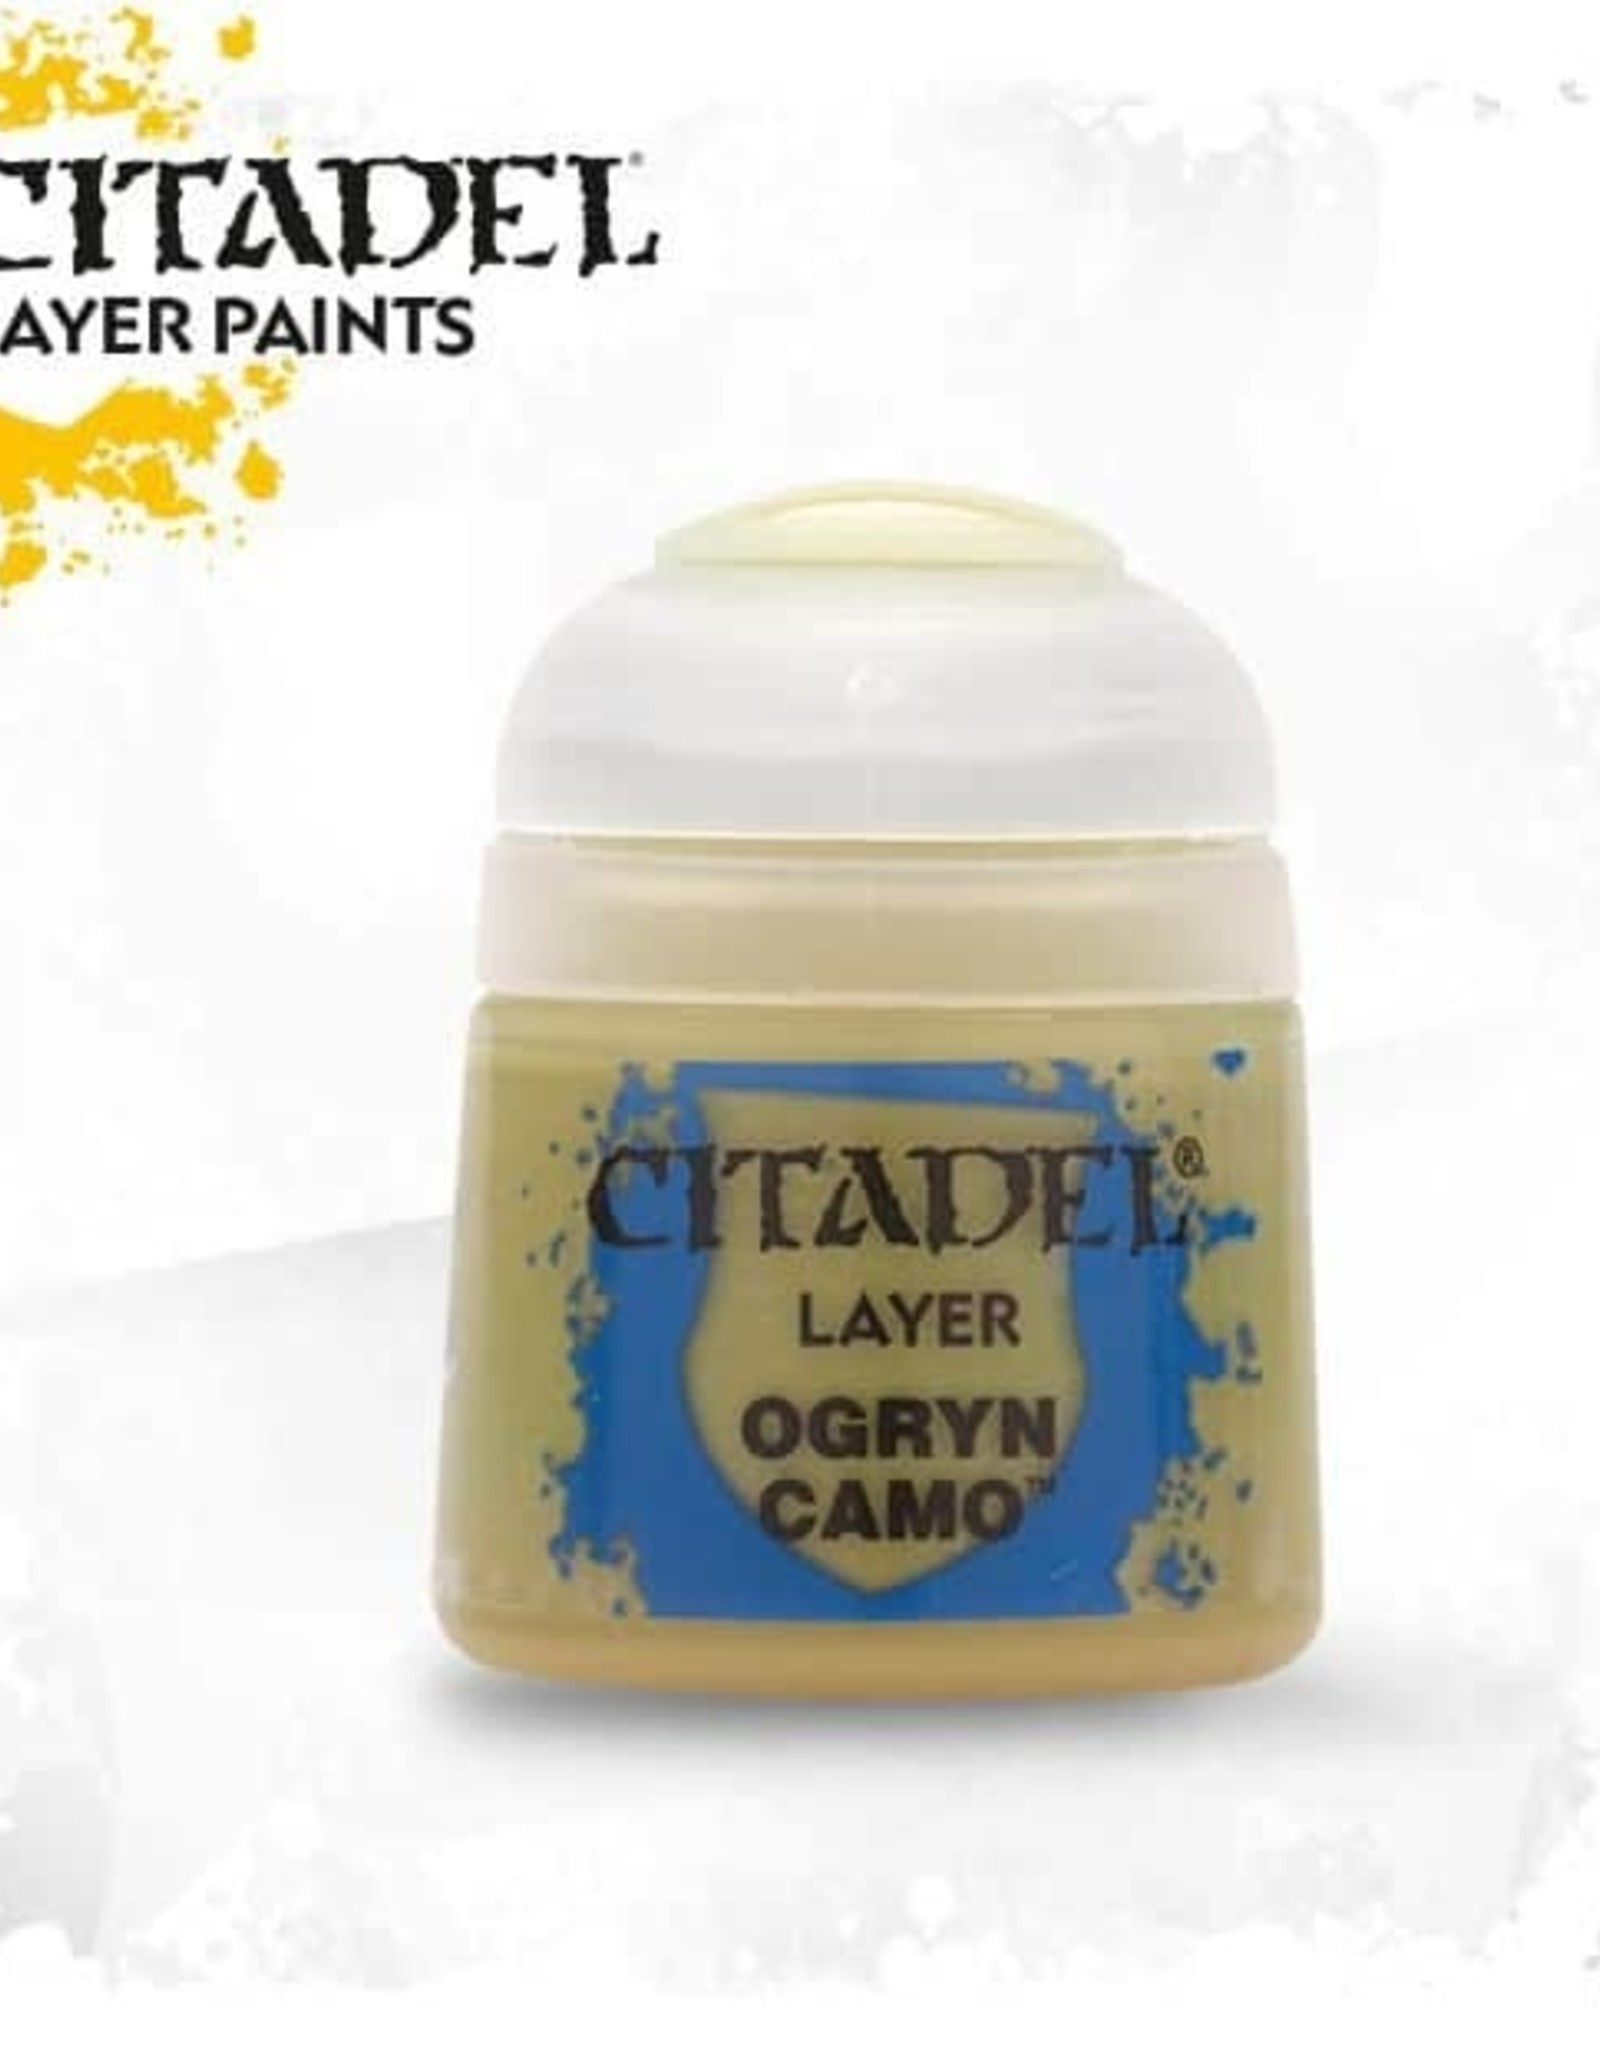 Games Workshop Citadel Paint: Layer - Ogryn Camo